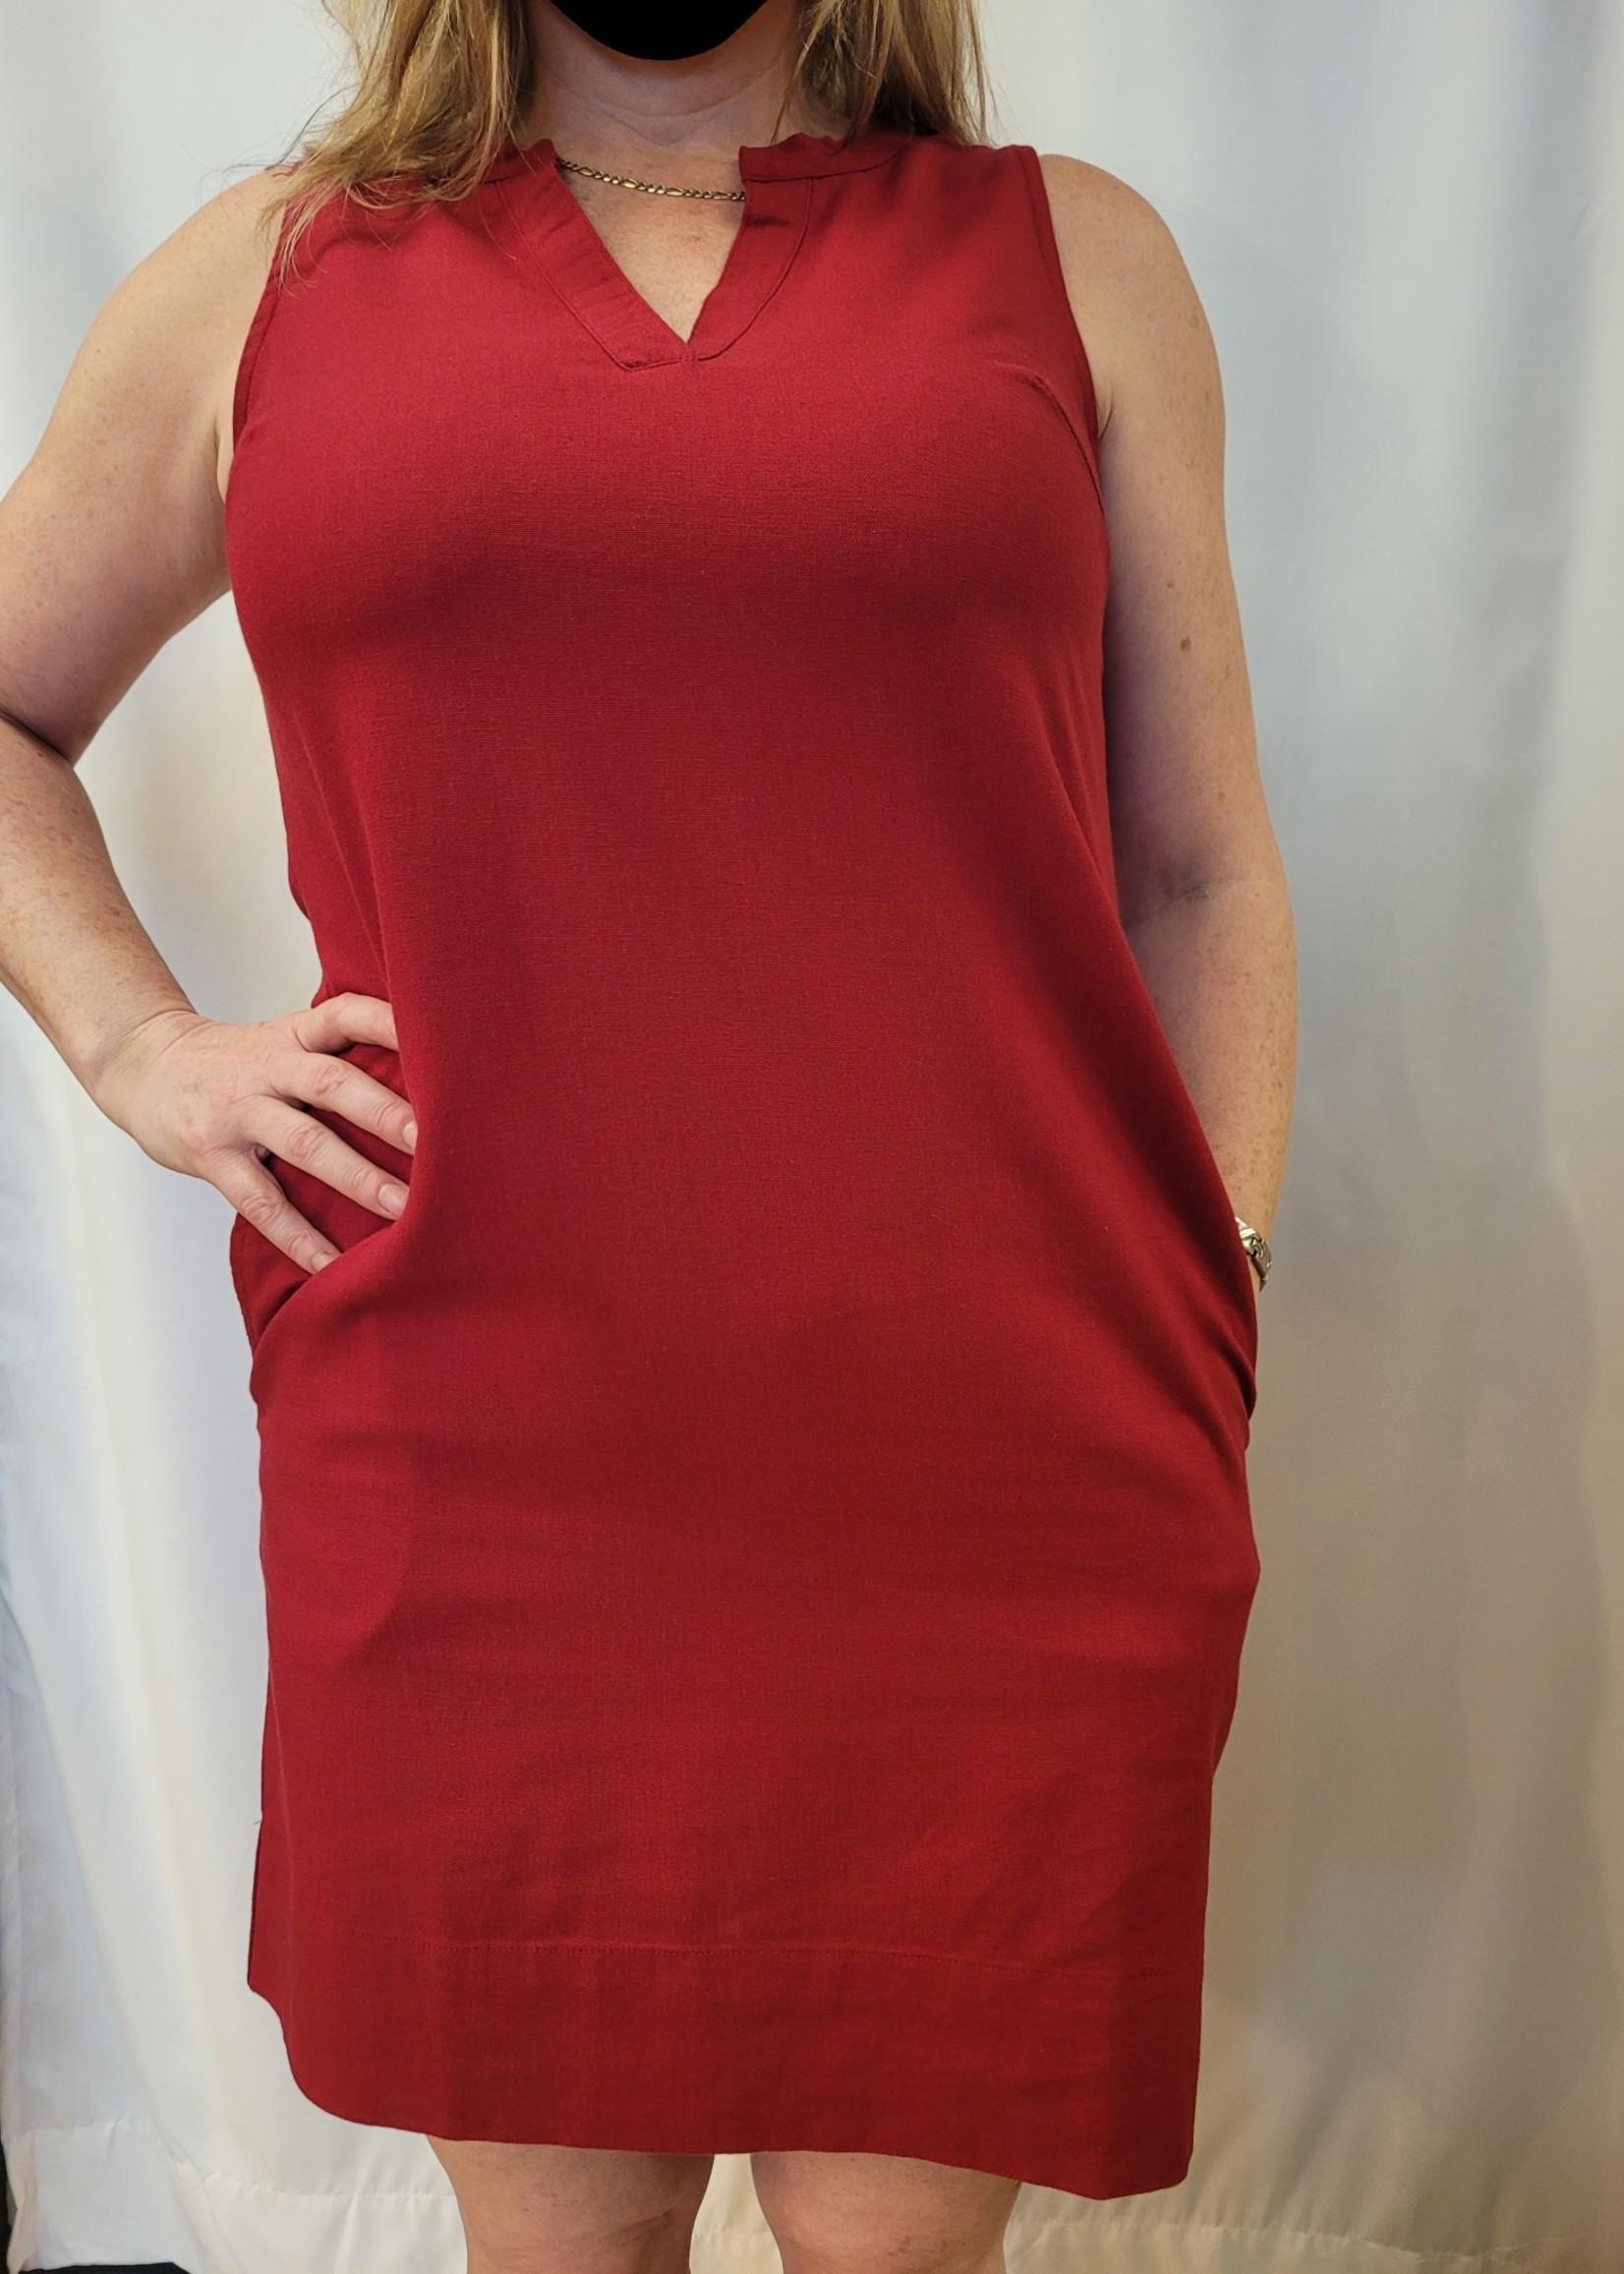 DKR & Co Sleeveless v-neck dress with pockets